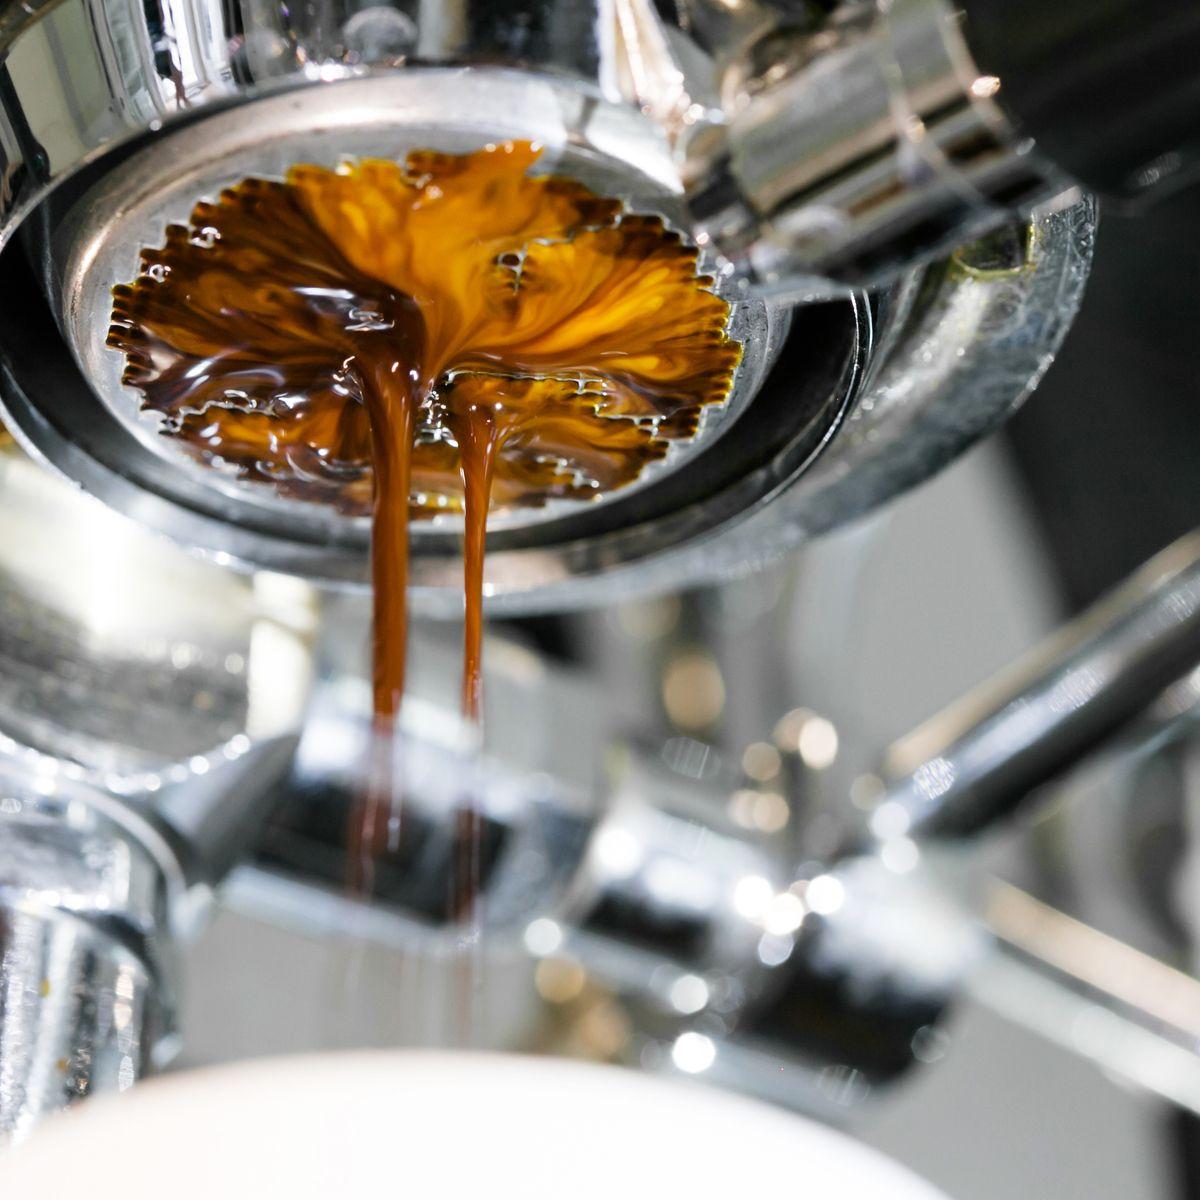 Pin by Michele Barratt on Good ideas/Tips Creamy coffee